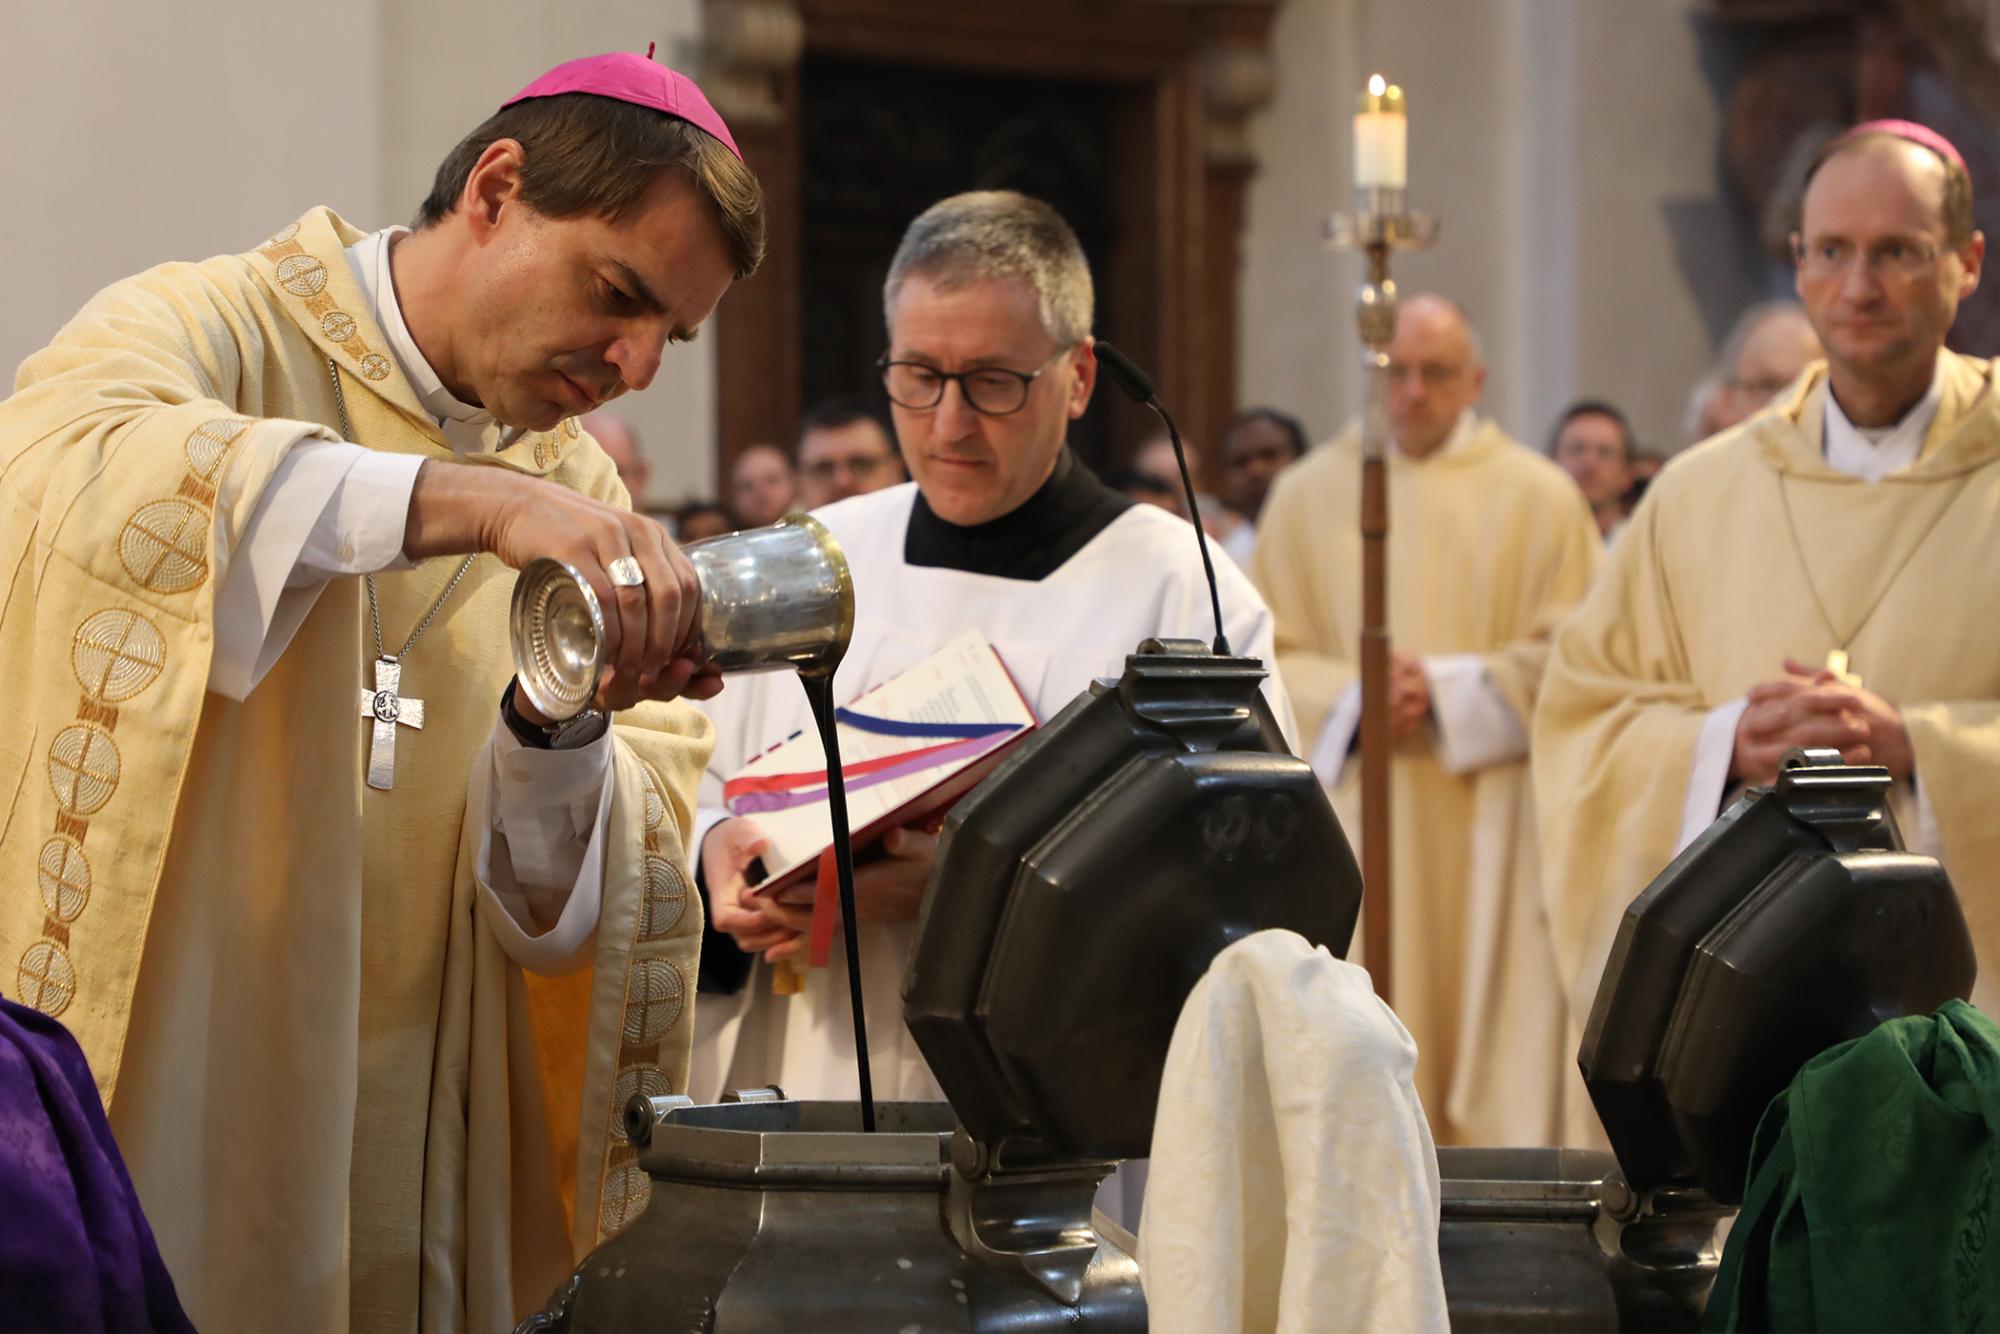 190415 Priesterdiakonentag Missa chrismatis foto7